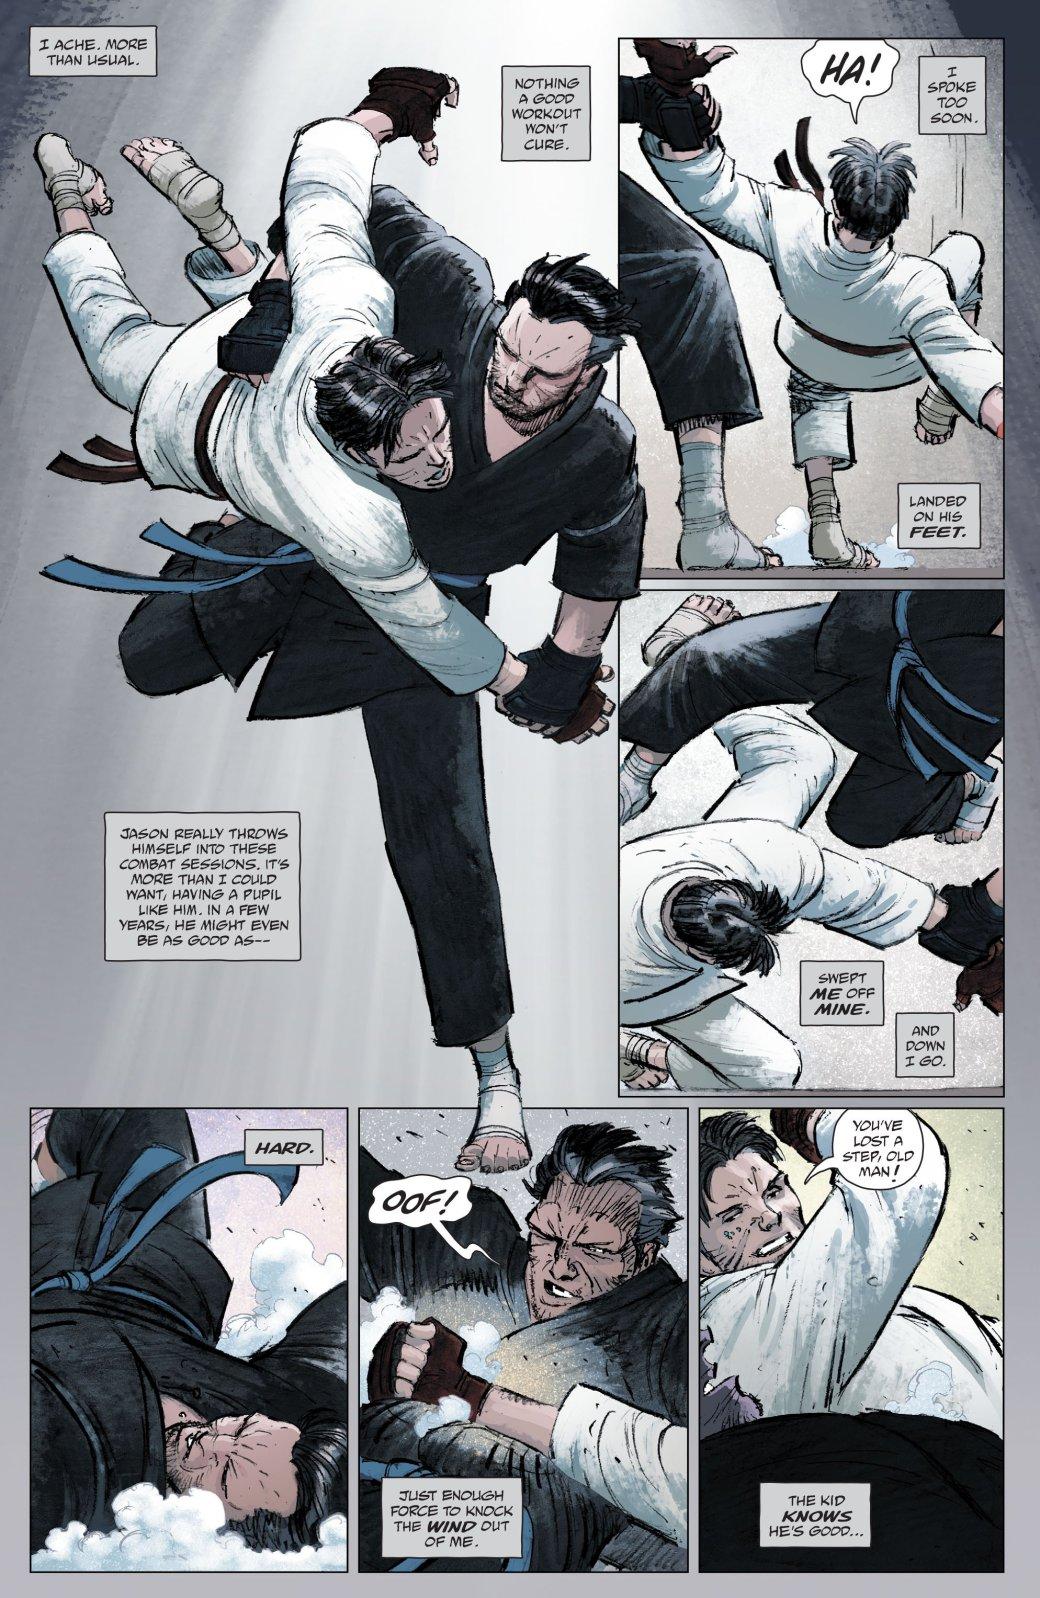 The Dark Knight: что нетак скомиксами Фрэнка Миллера про Бэтмена? | Канобу - Изображение 4